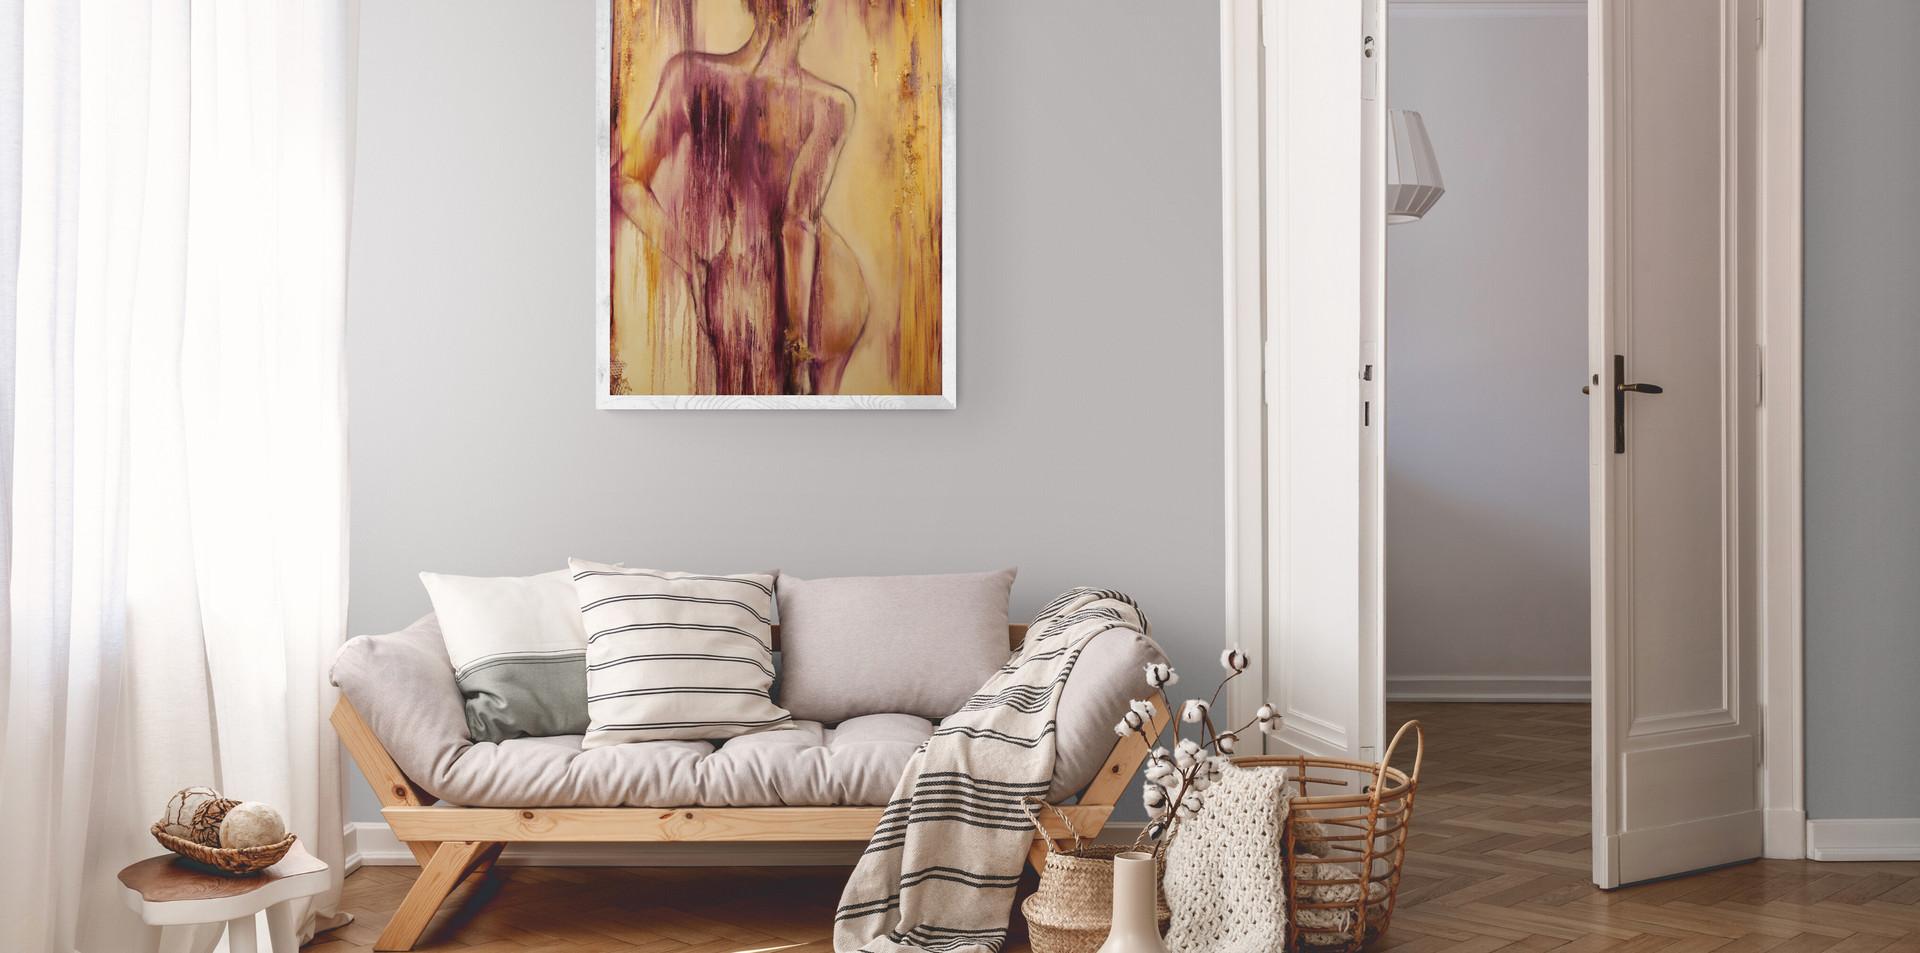 oil-painting-woman-nude-Jenie-gospodinova